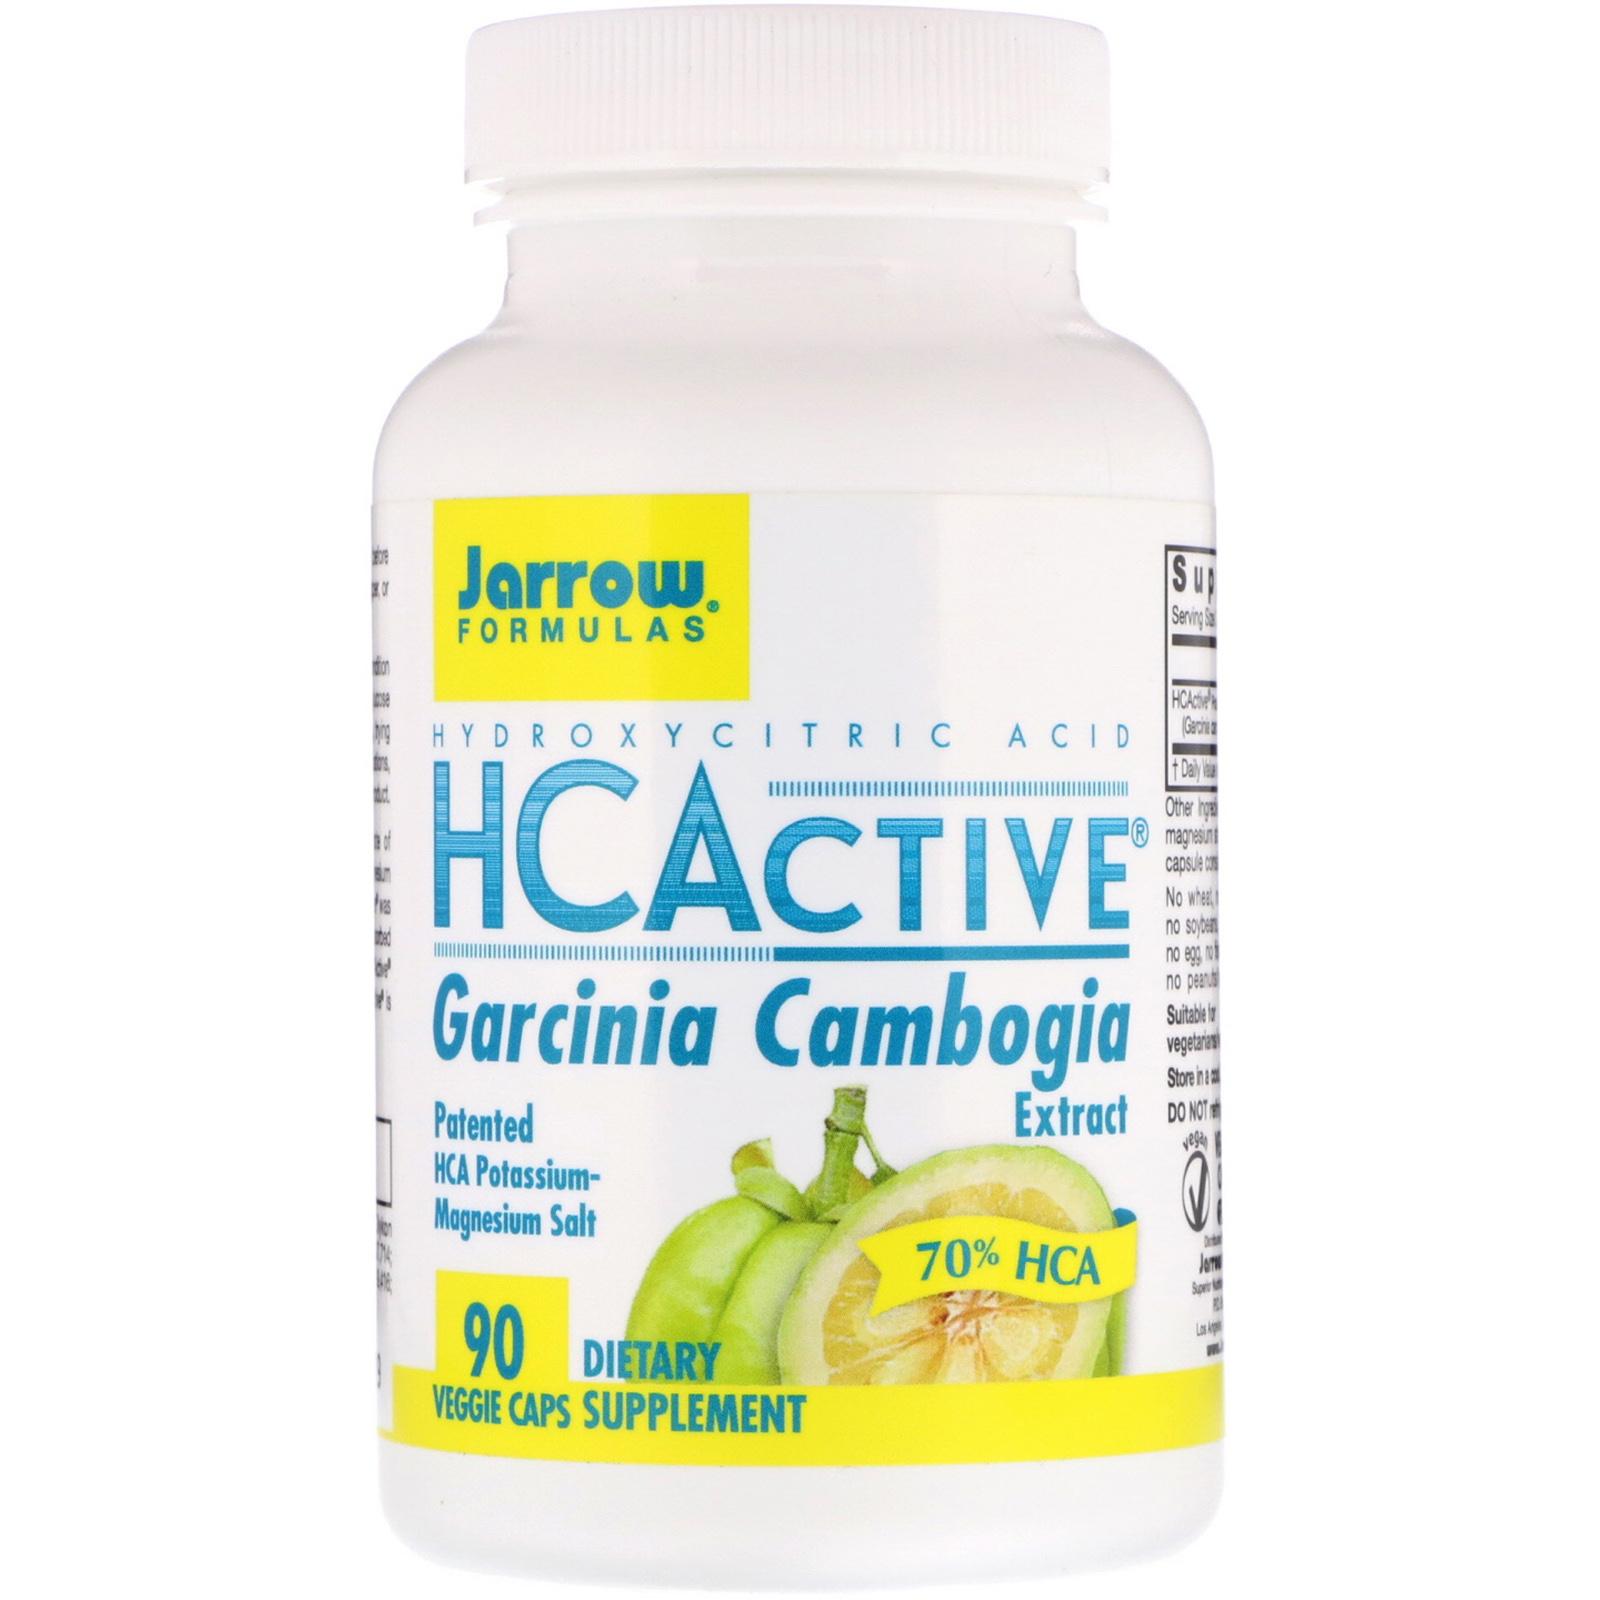 Jarrow Formulas Hcactive Garcinia Cambogia Extract 90 Veggie Caps